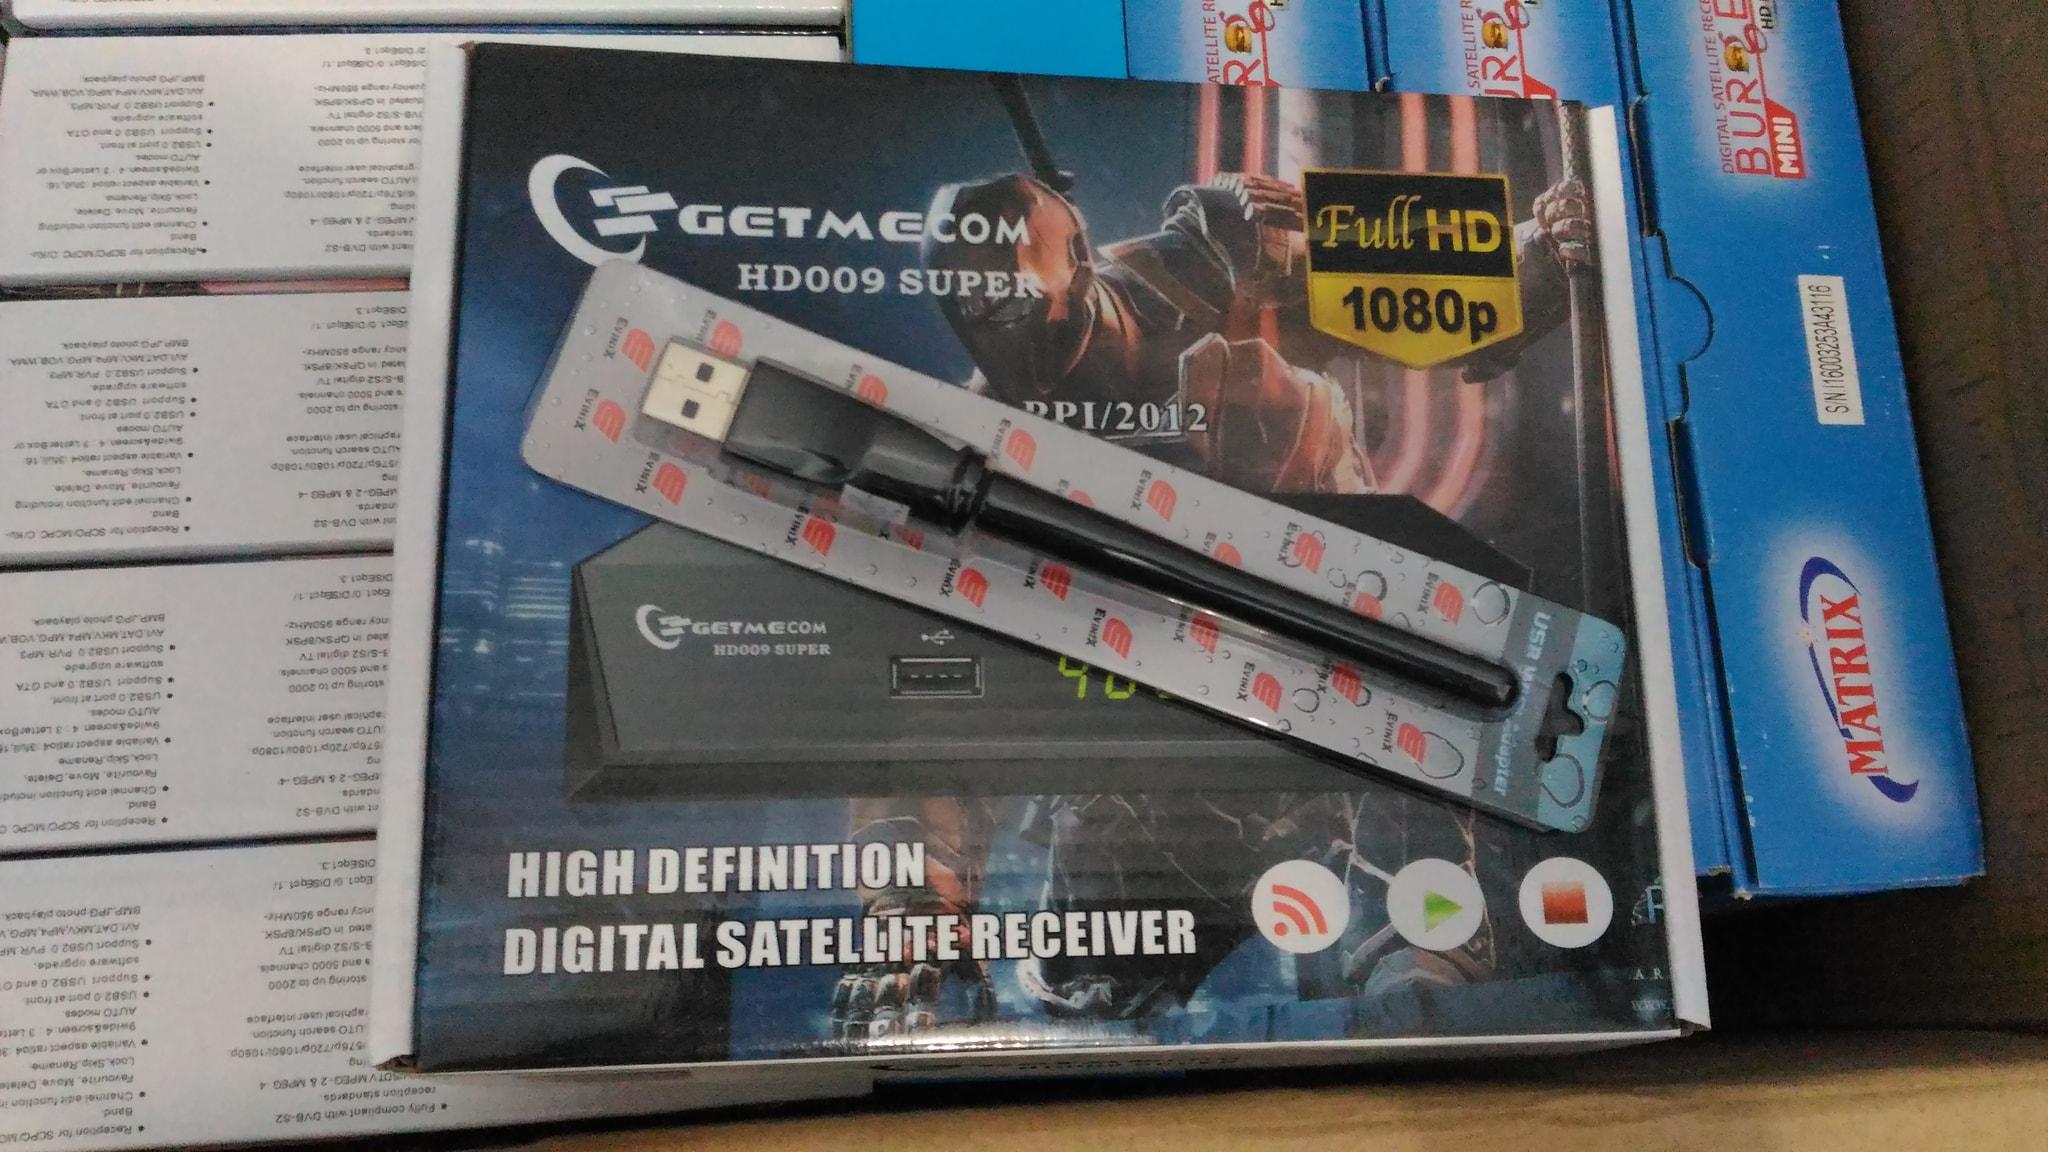 Getmecom HD009 Super + Dongle Wifi